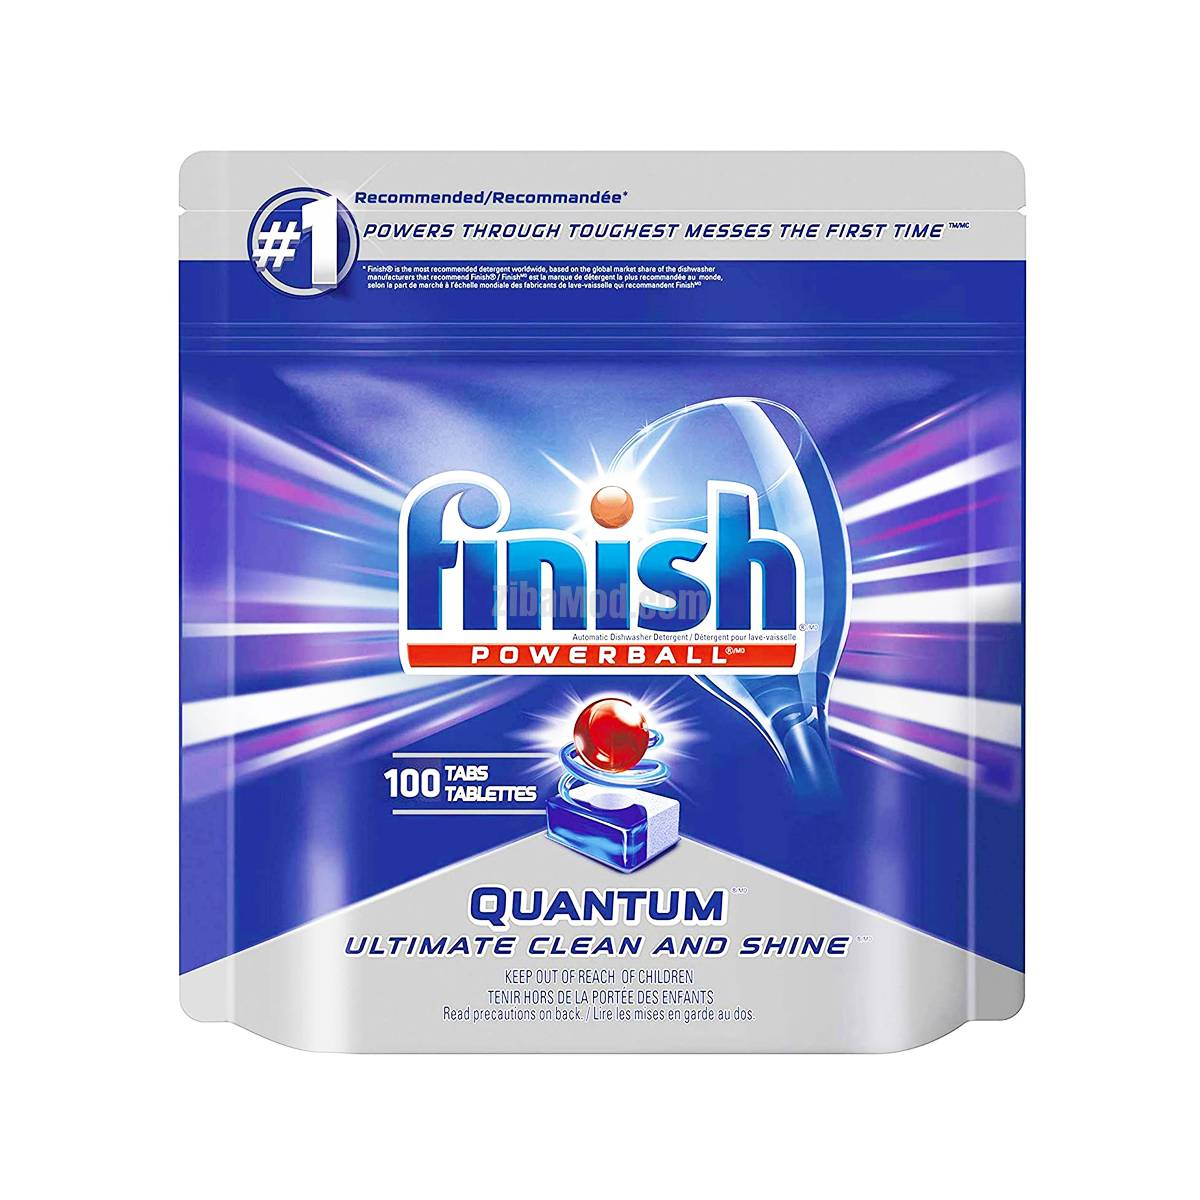 تصویر قرص ماشین ظرفشویی کوانتوم فینیش 100 تایی ا Finish Quantum Dishwasher Tablets, Pack of 100 Finish Quantum Dishwasher Tablets, Pack of 100